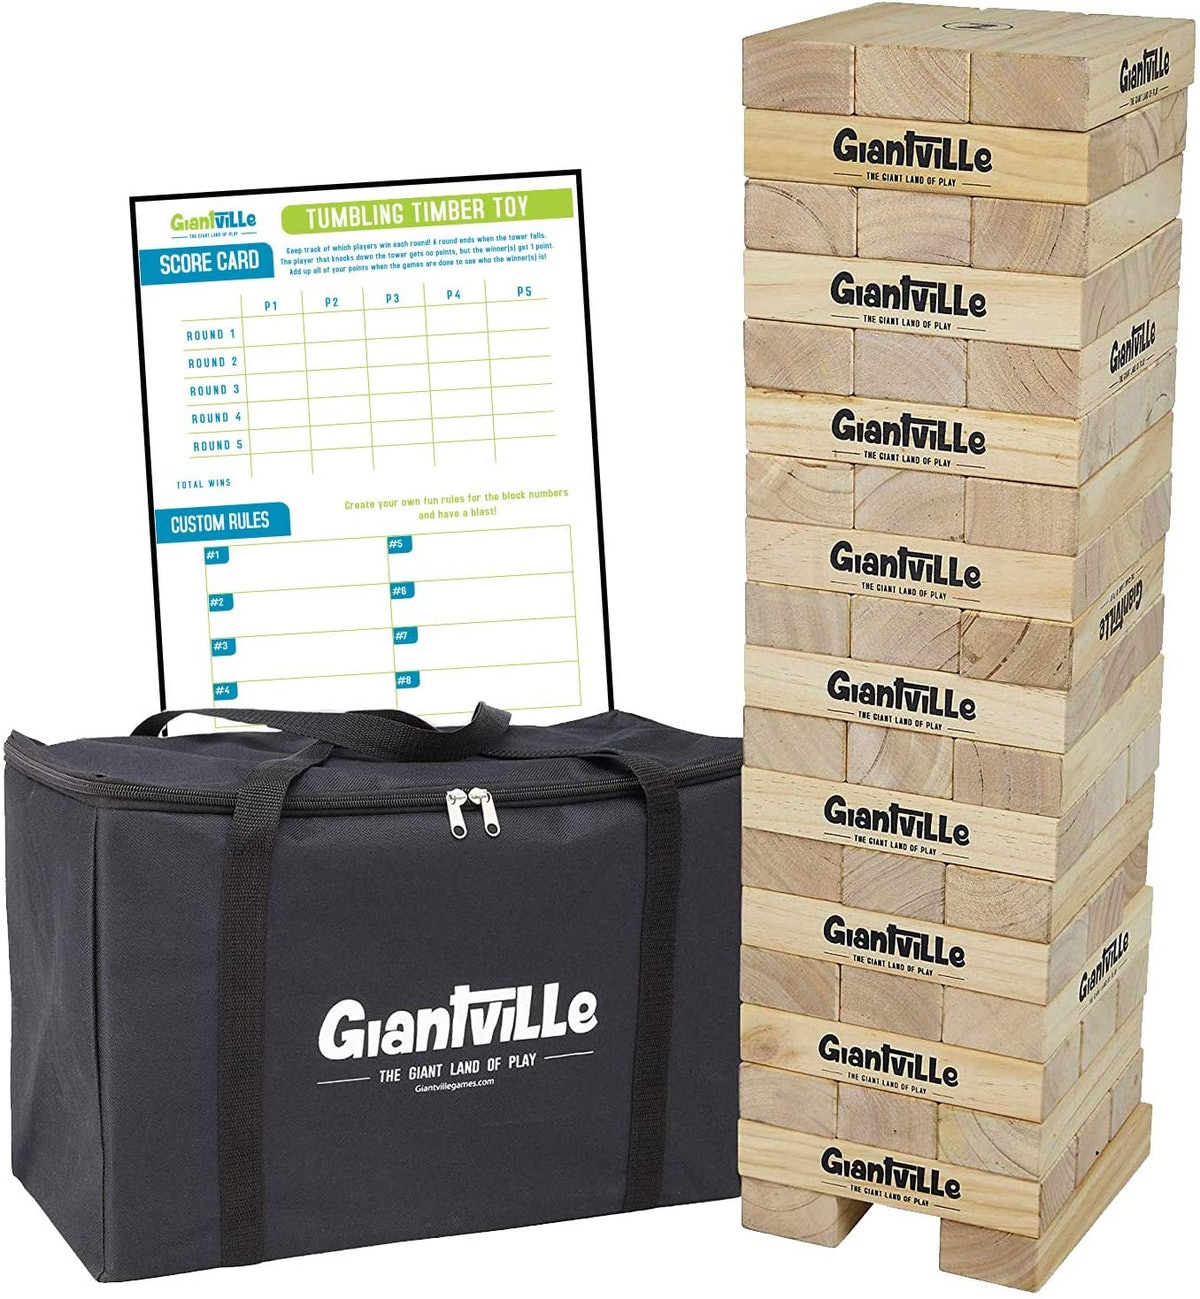 Giantville Giant Tumbling Timber Toy